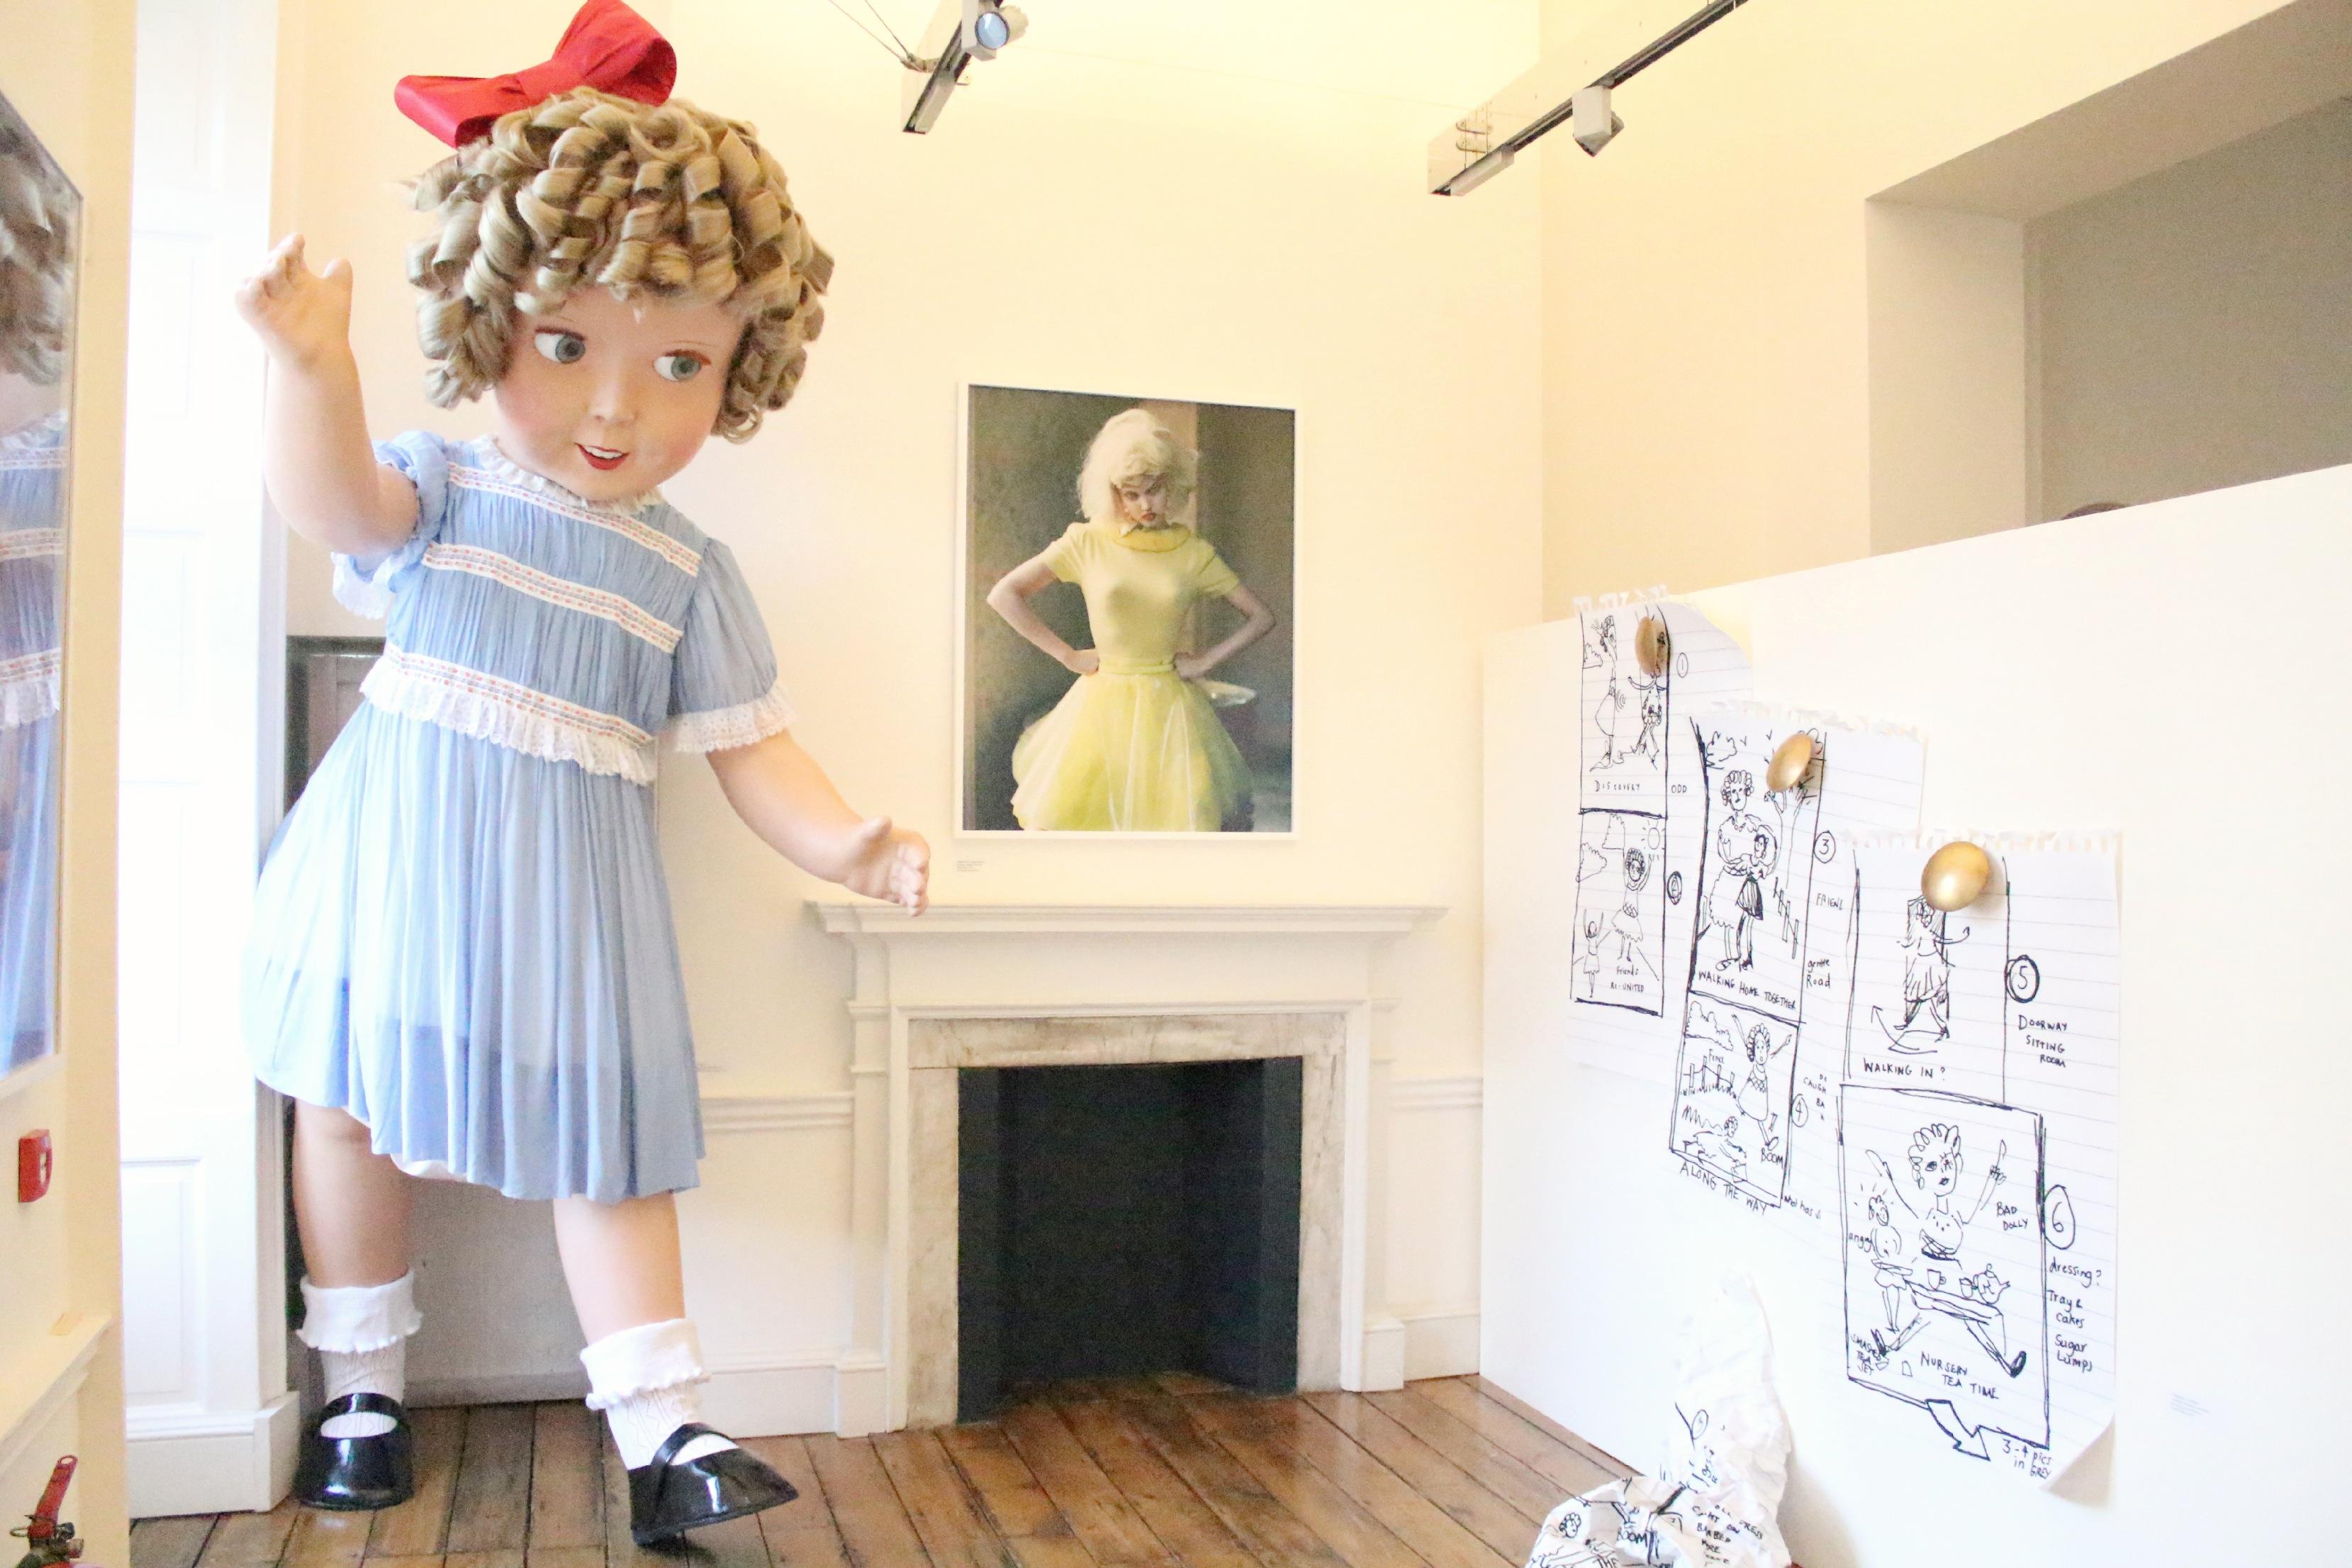 A Girl, A Style _ Tim Walker Story Teller 2